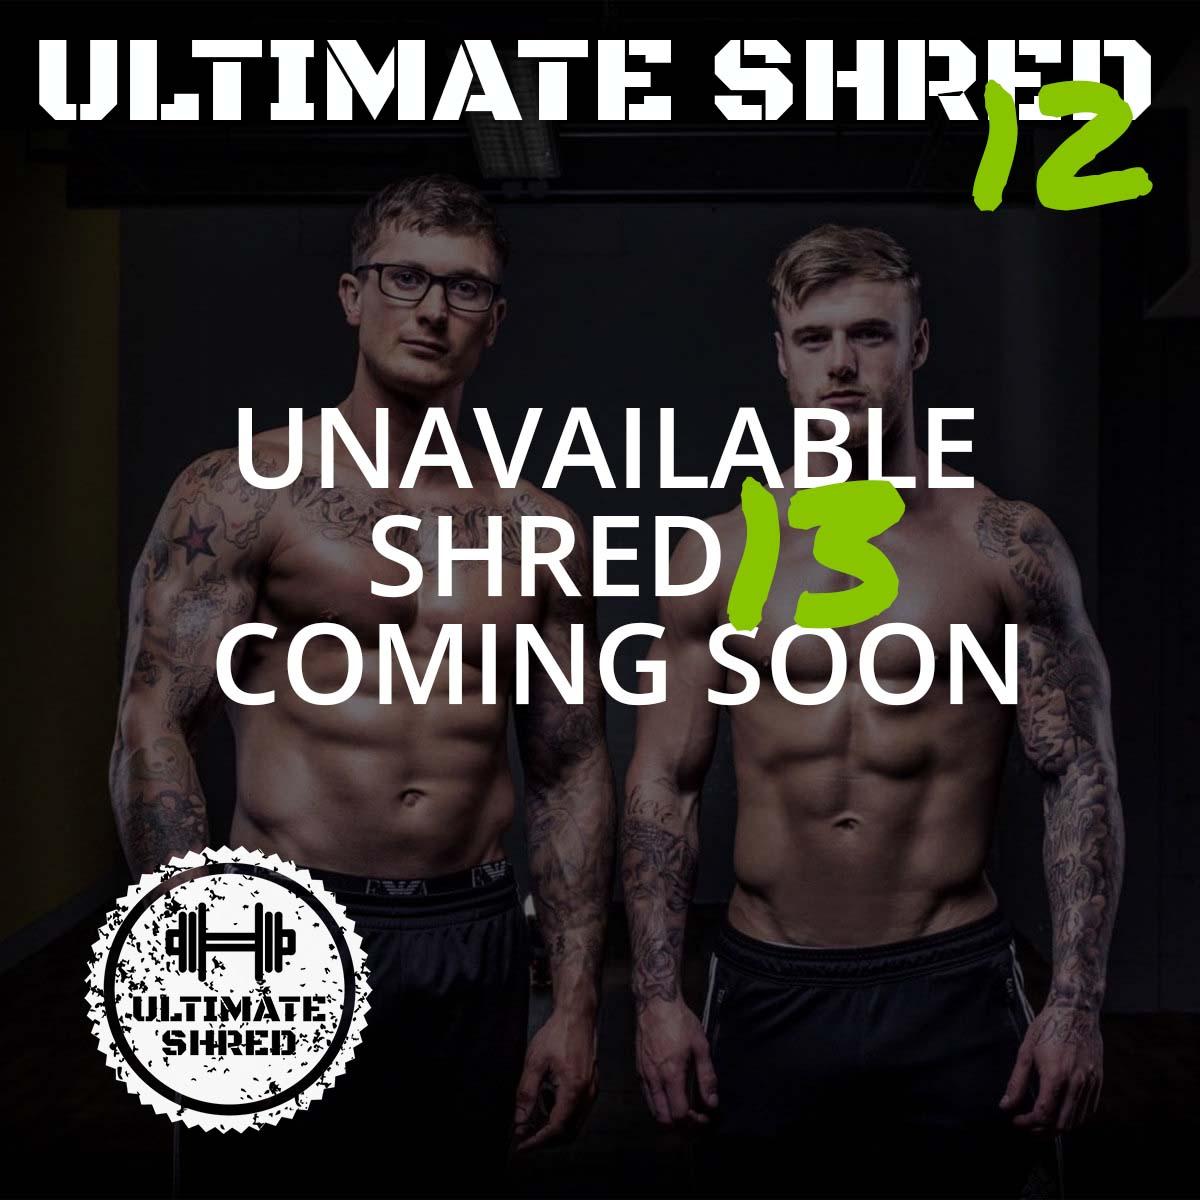 Ultimate Shred 12